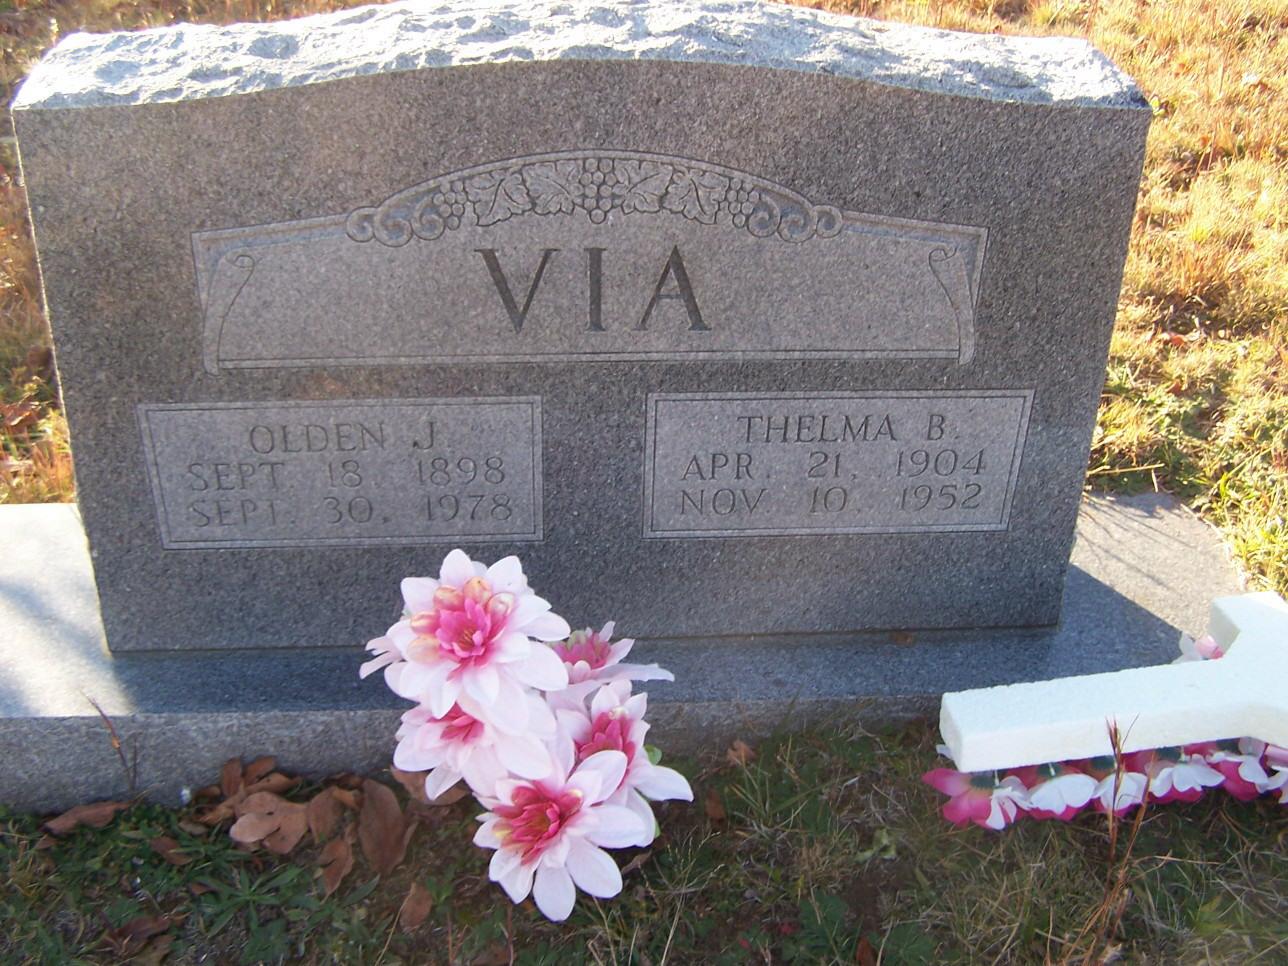 Thelma Beatrice Wiley